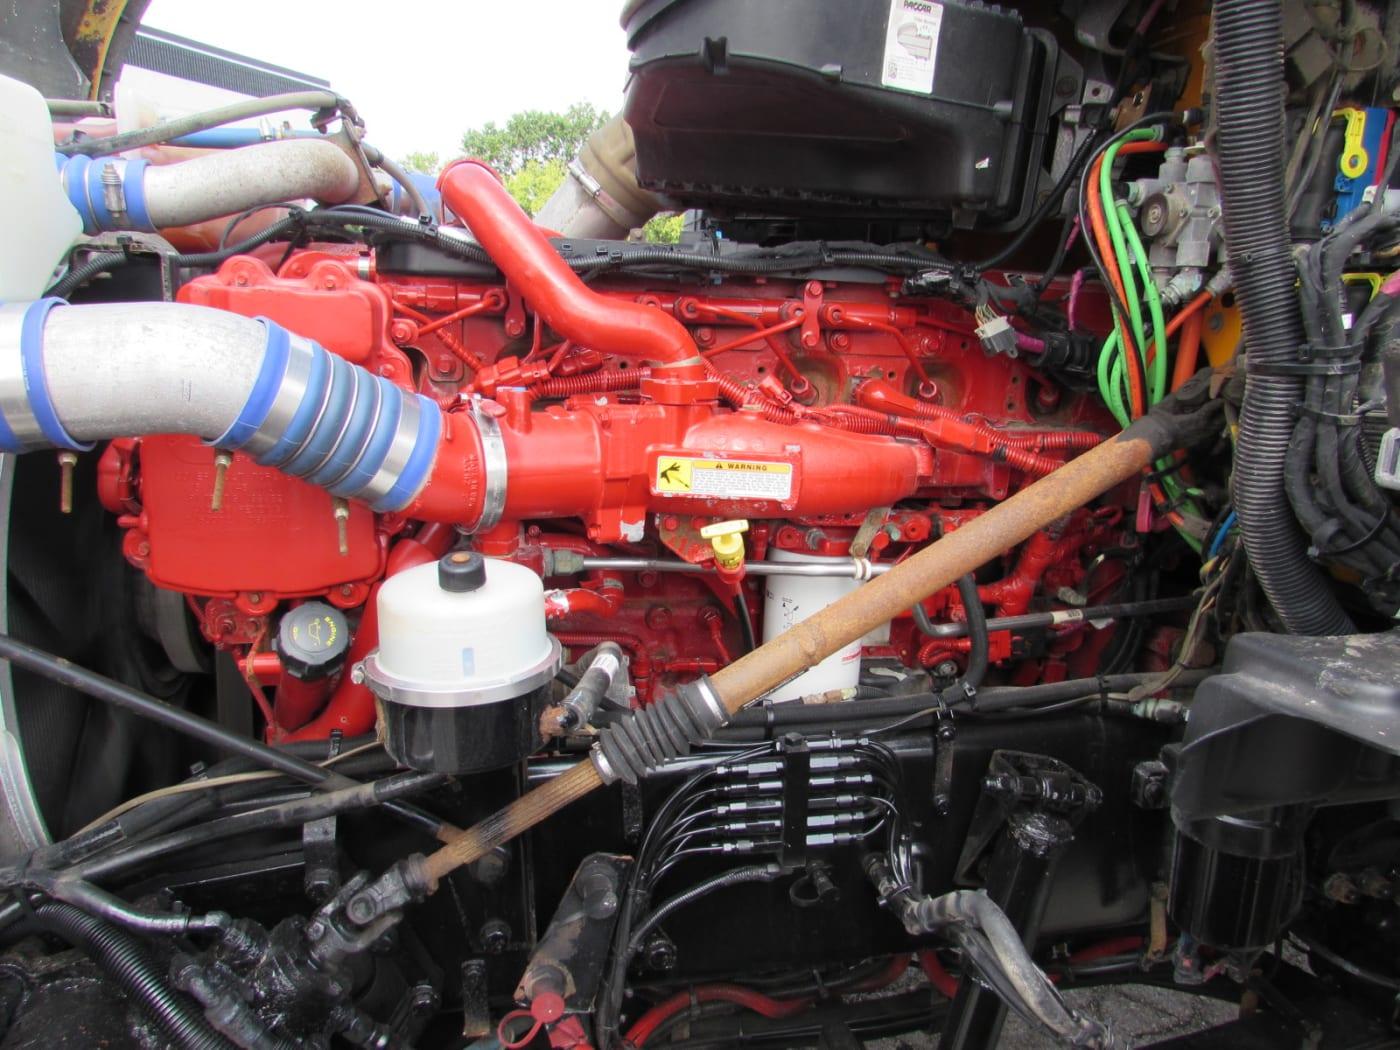 2017 Kenworth T880 UHJ147874A full